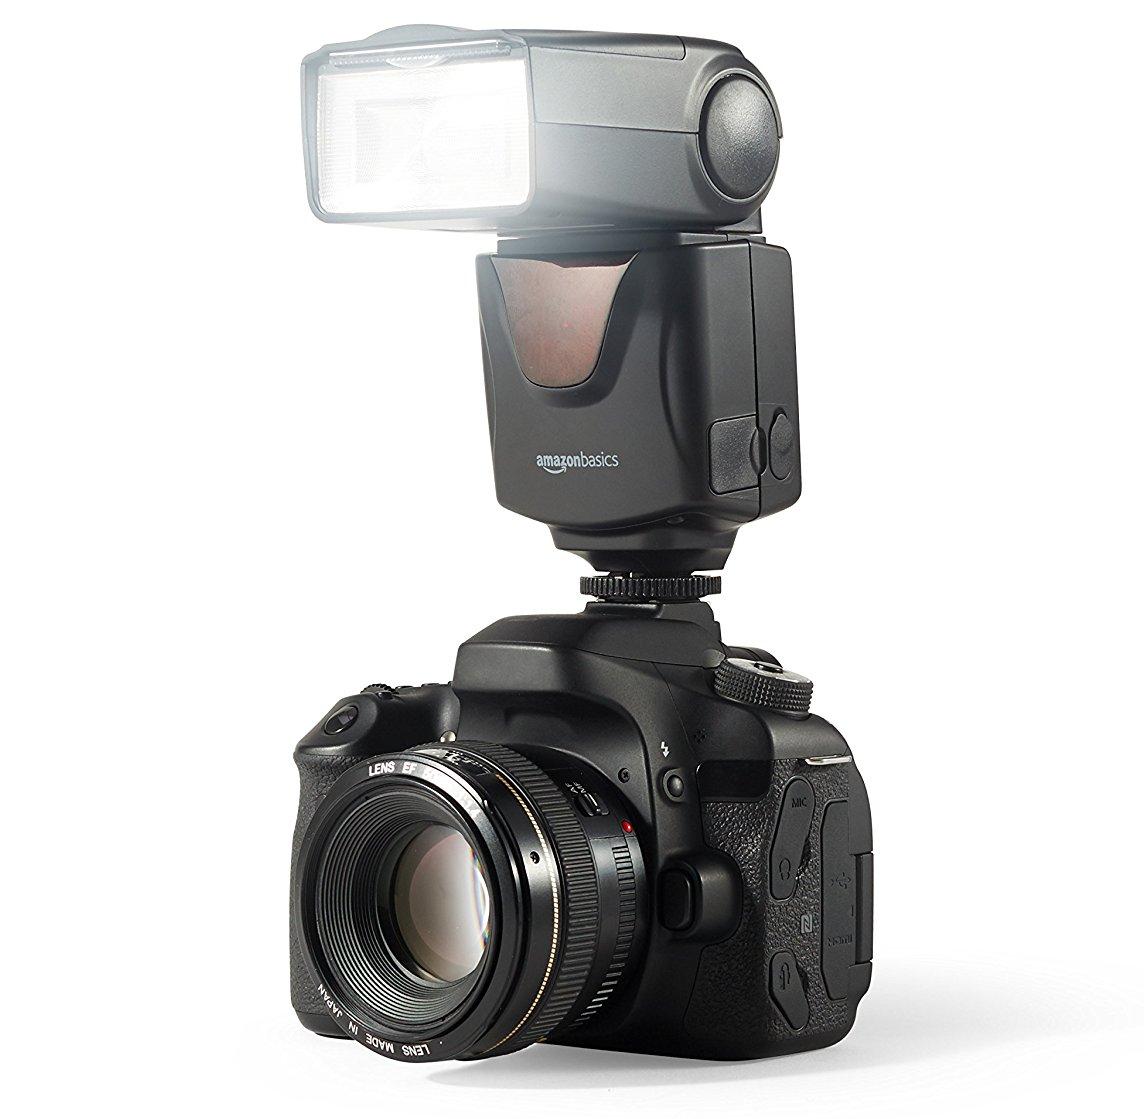 Вспышка AmazonBasics VT560 на камере